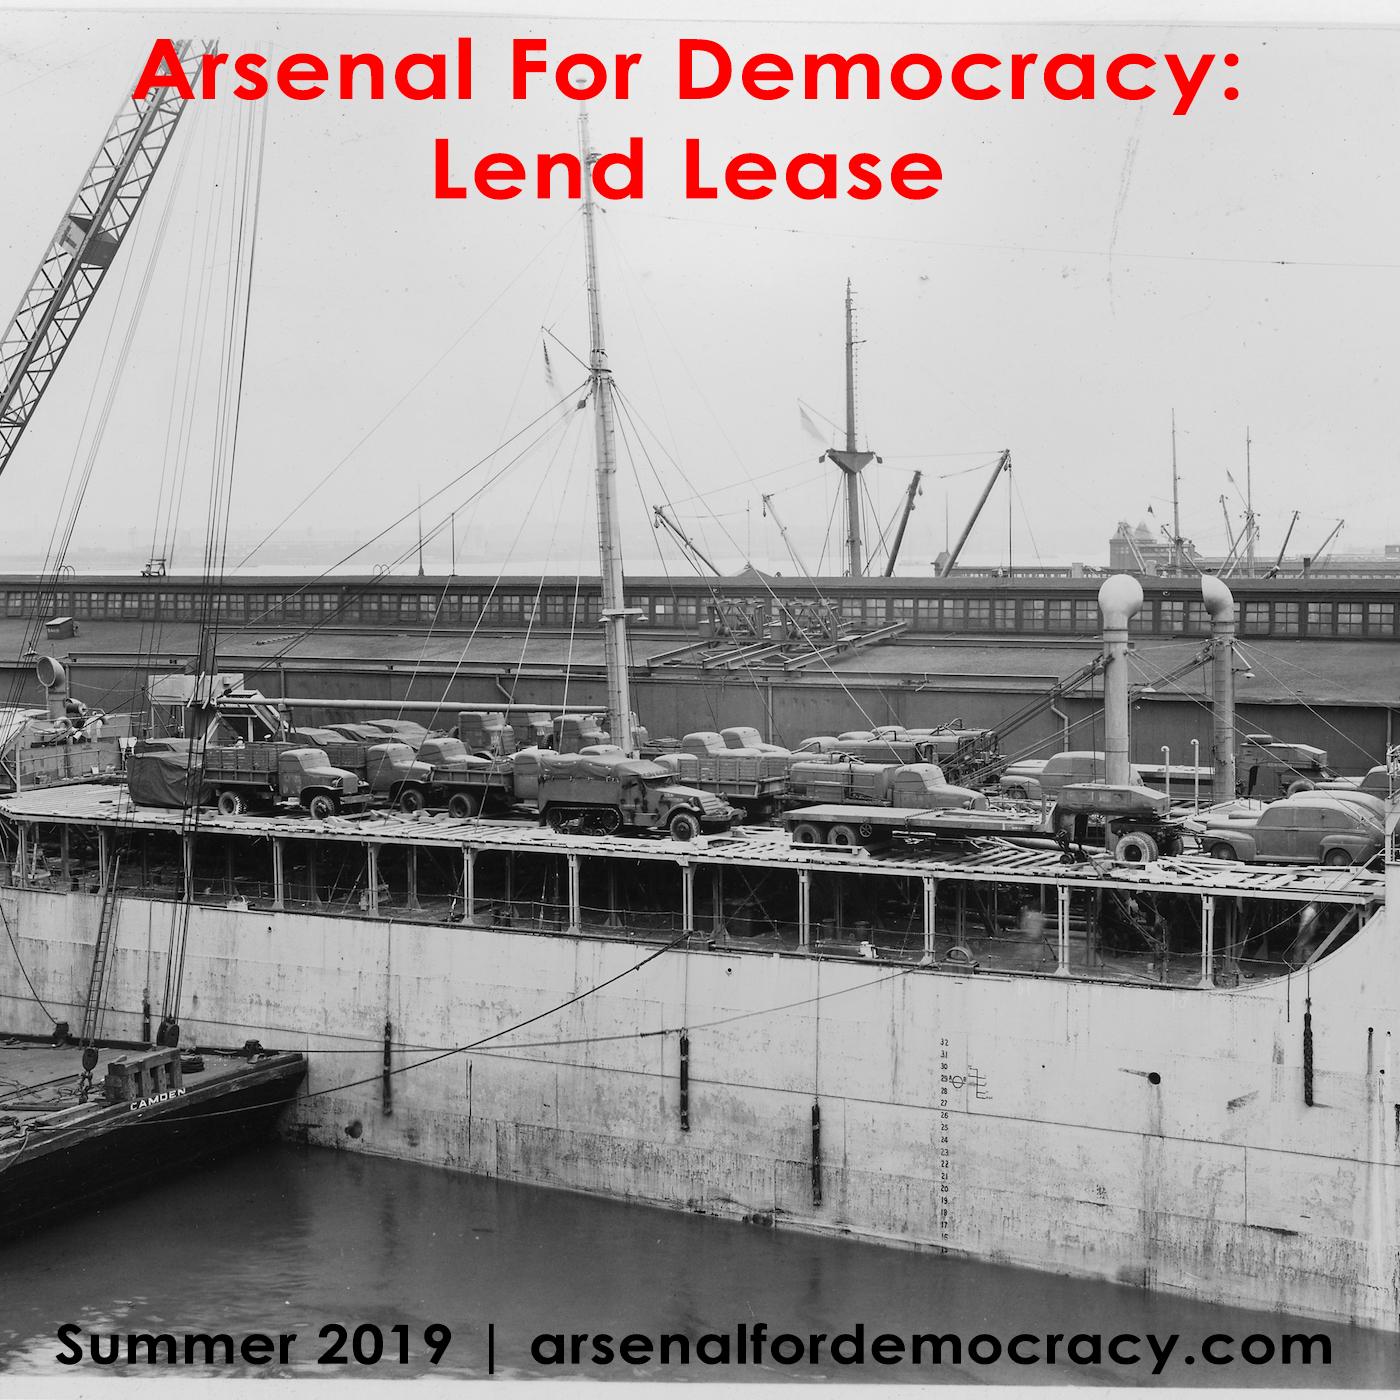 Arsenal for Democracy